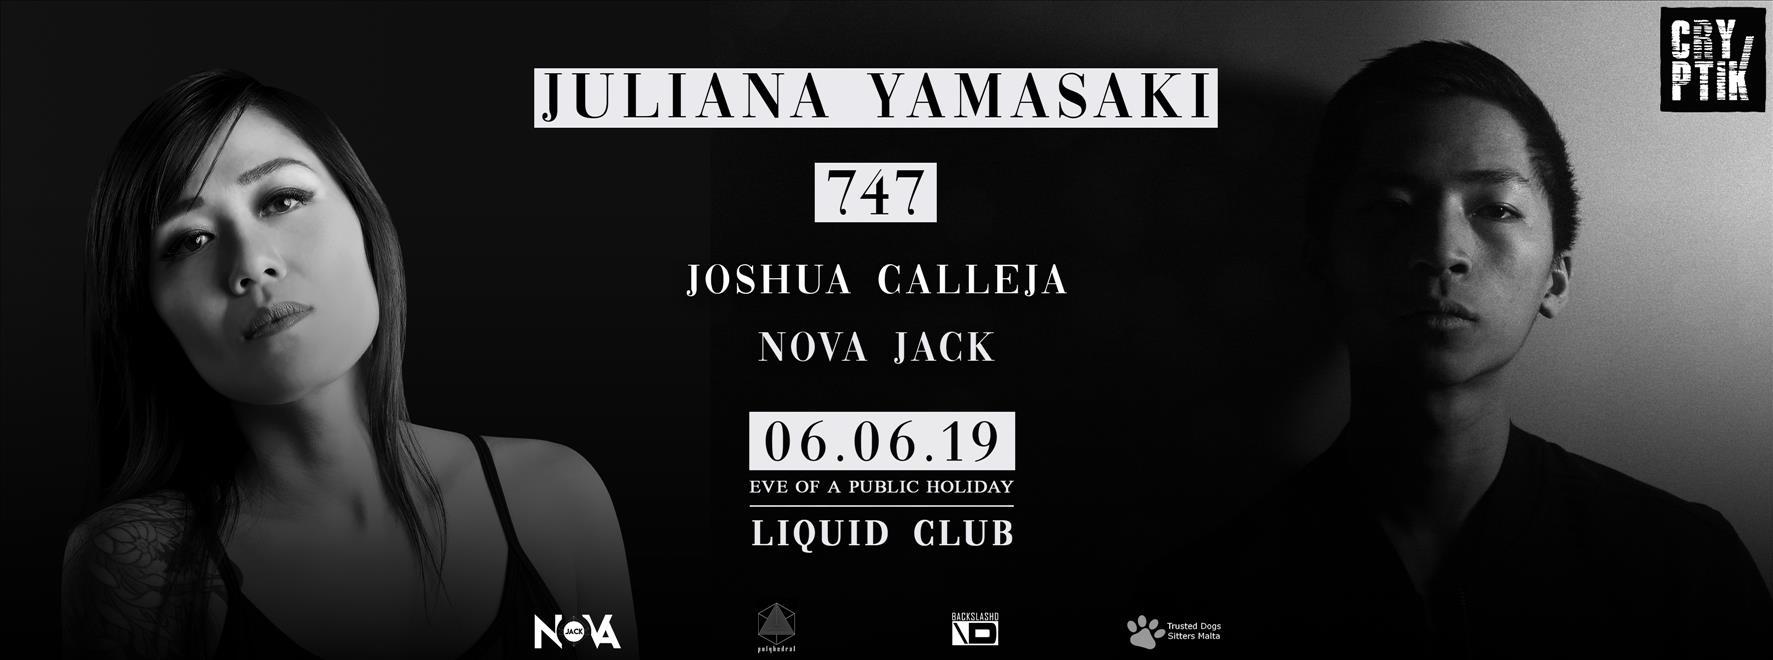 Cryptik : Juliana Yamasaki & 747 // 6th June 2019 flyer